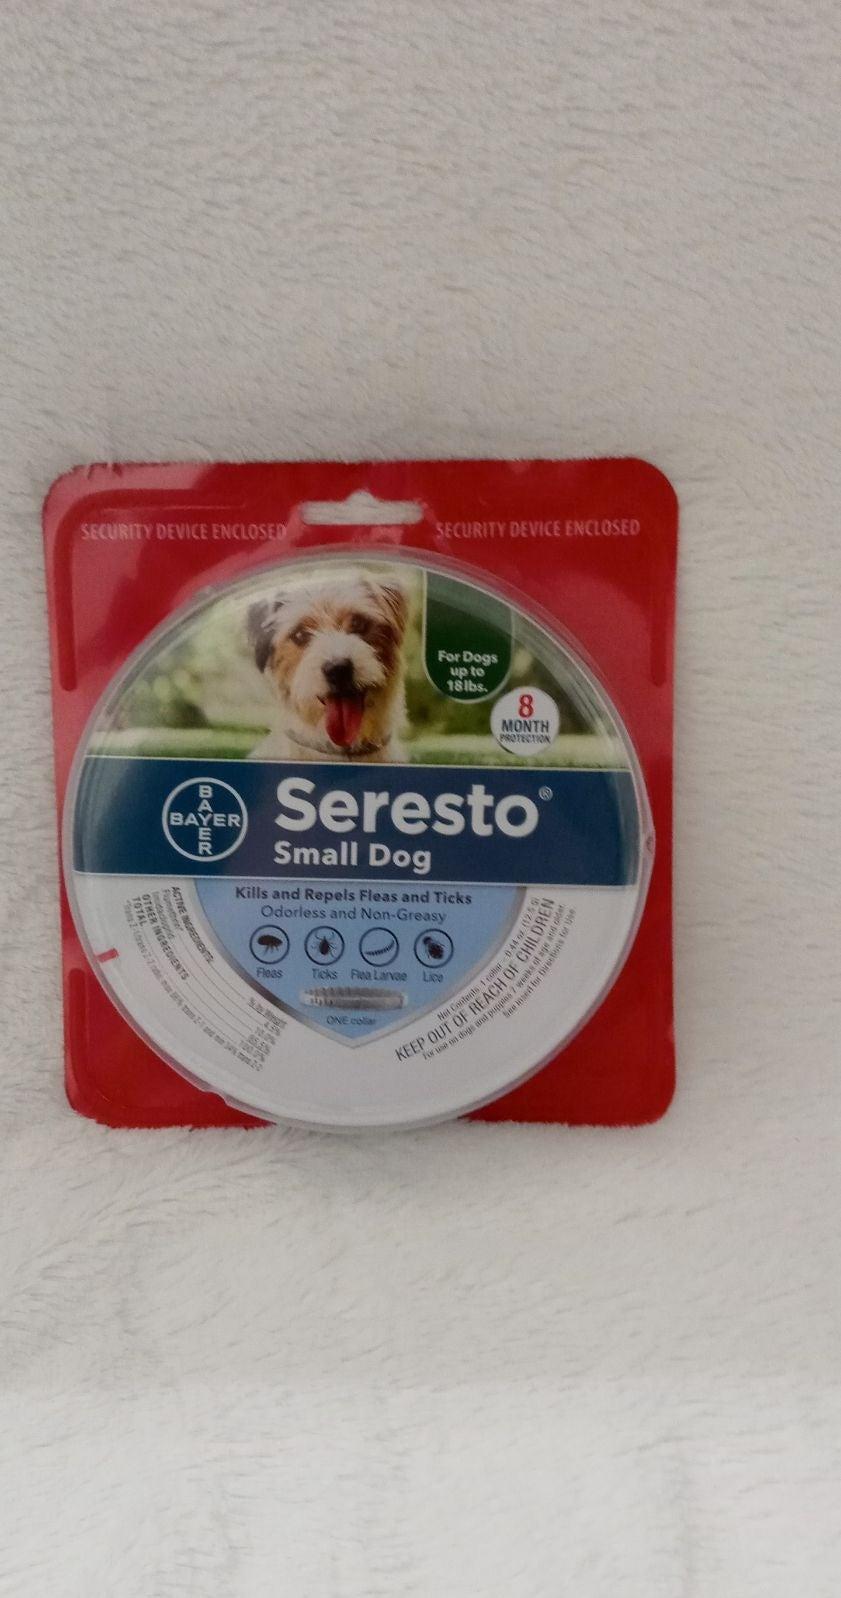 Seresto 8 Month Flea & Tick Prevention C